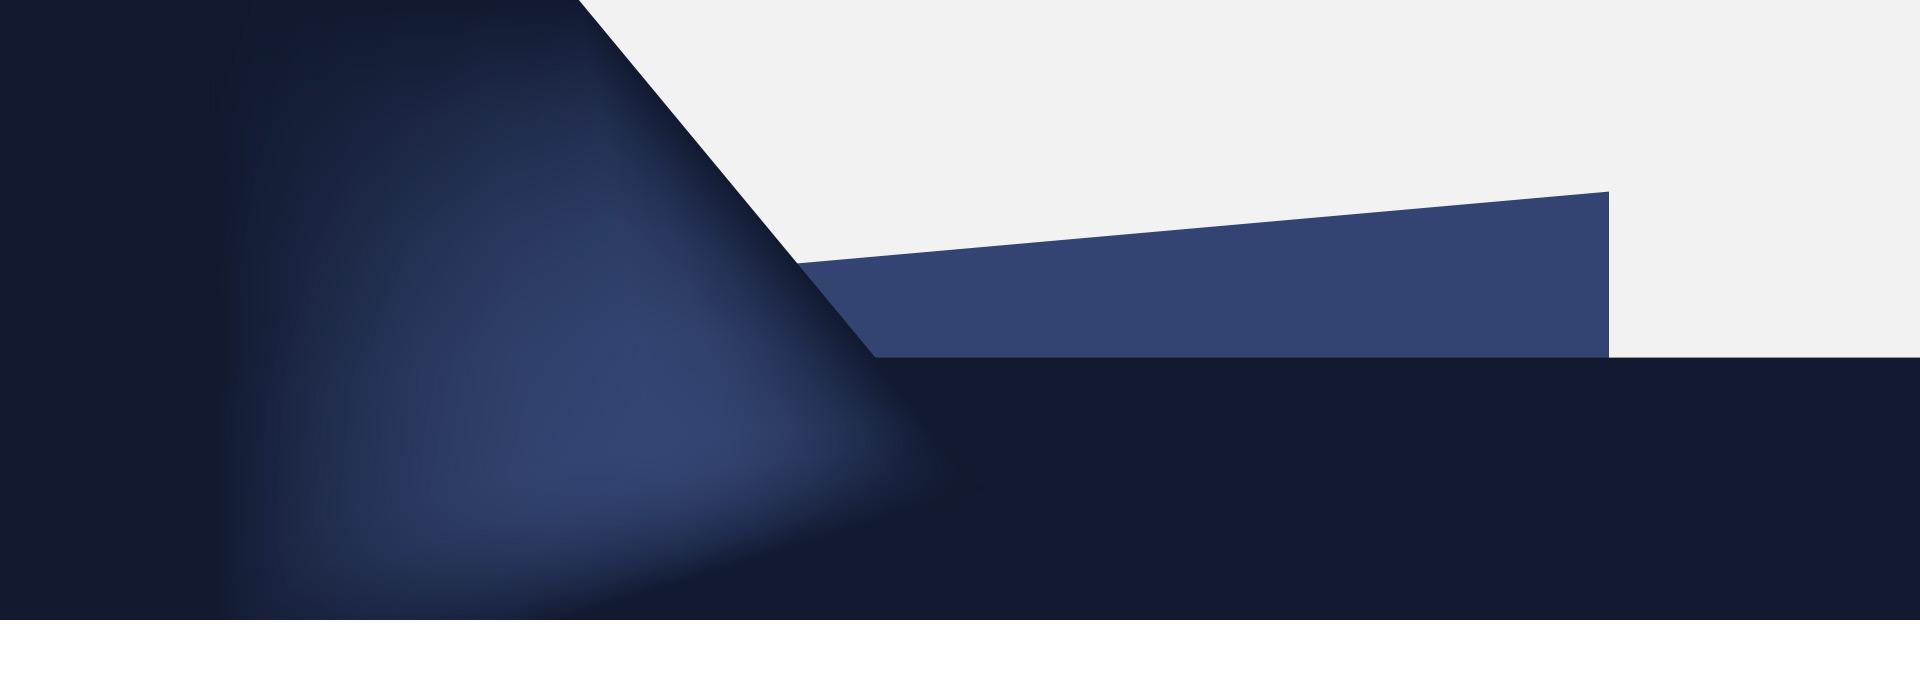 http://uned.ac.cr/sites/default/files/revslider/image/encuesta_guesss_bg.jpg